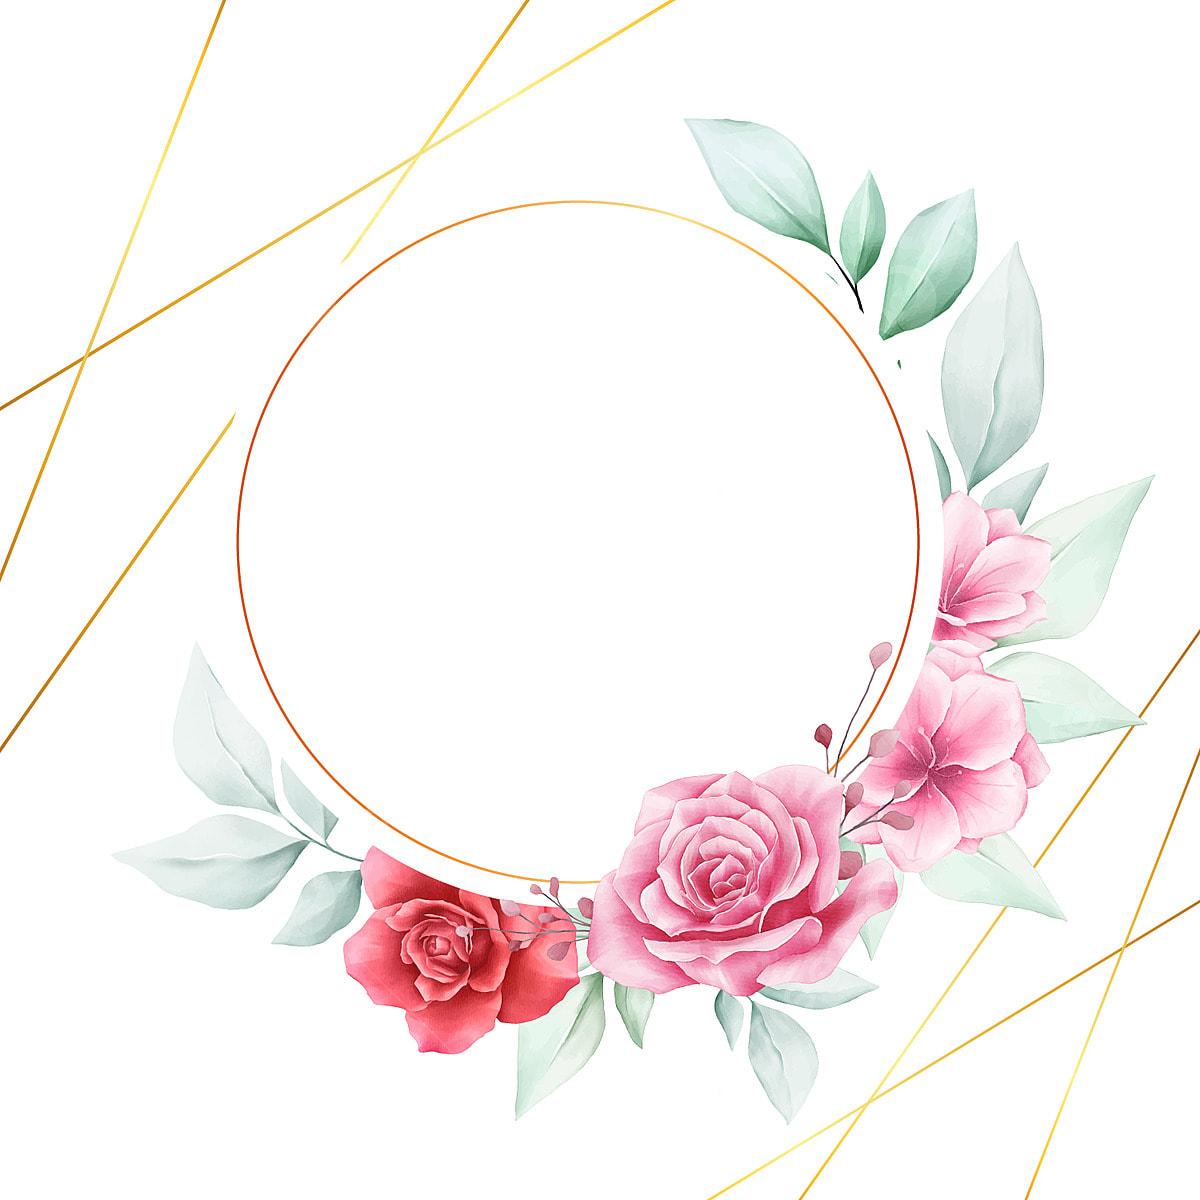 elegant watercolor flowers frame for wedding logo card